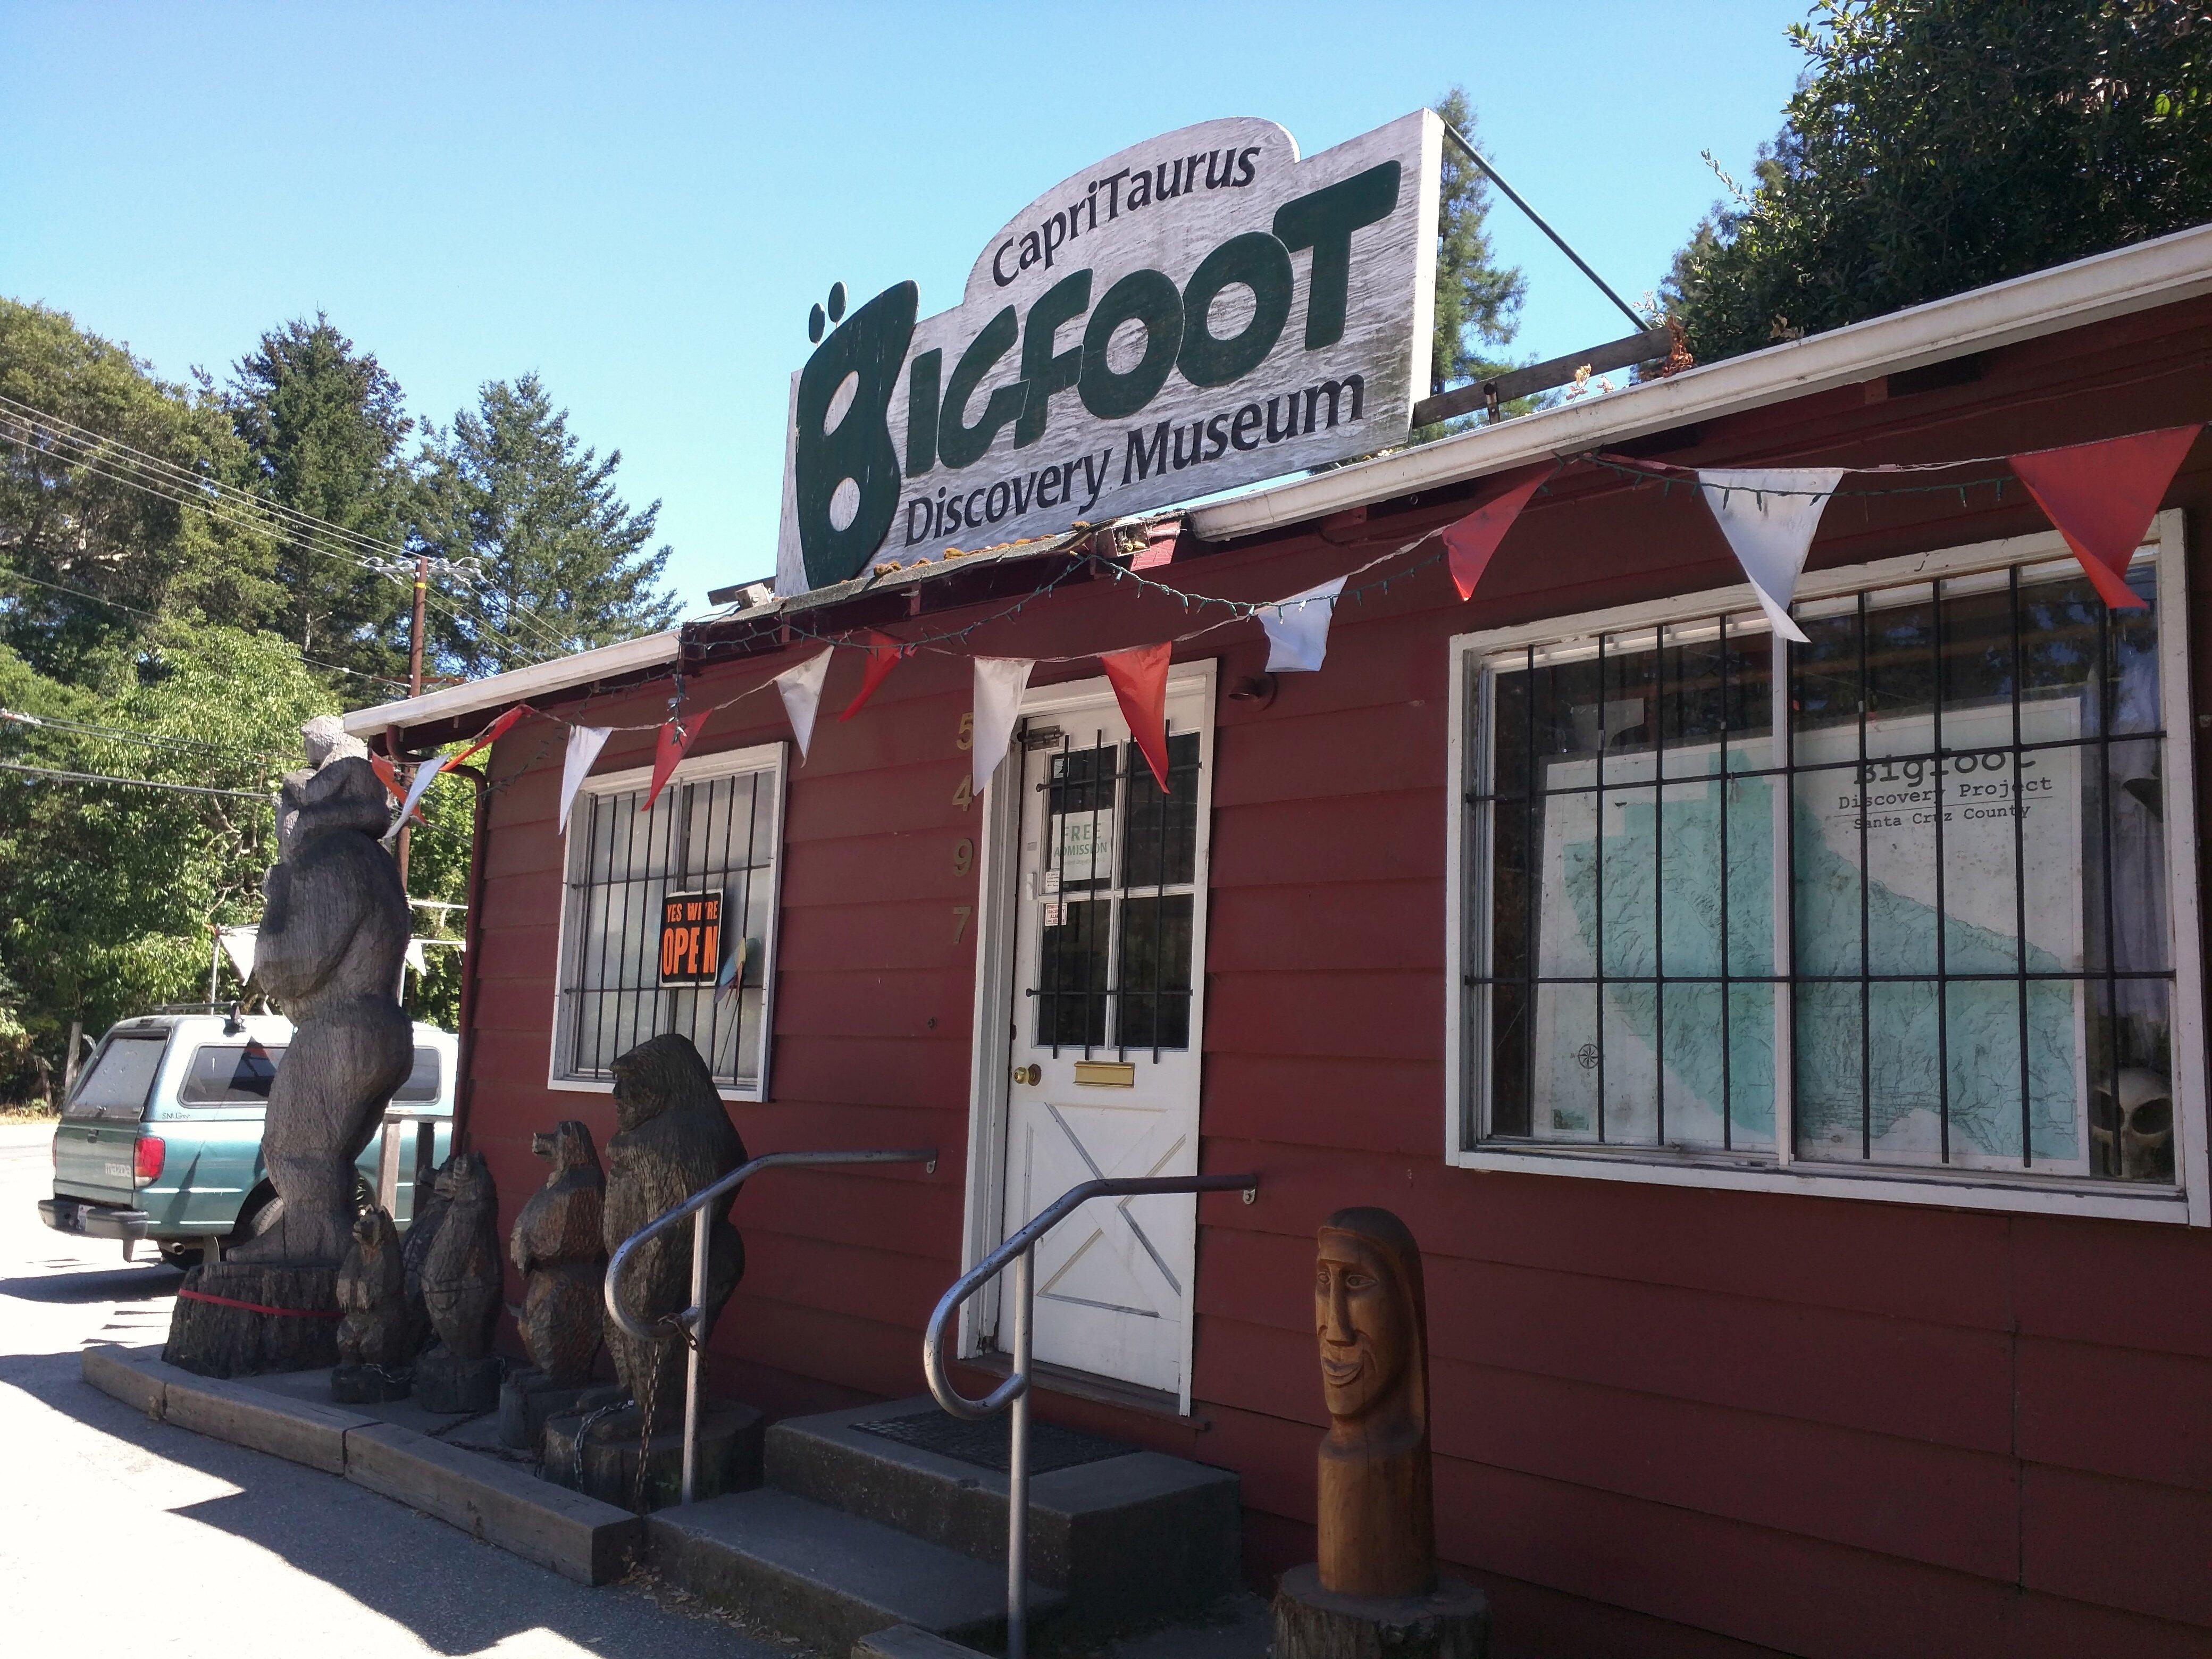 Bigfoot discovery museum in Felton! D (27292772073).jpg